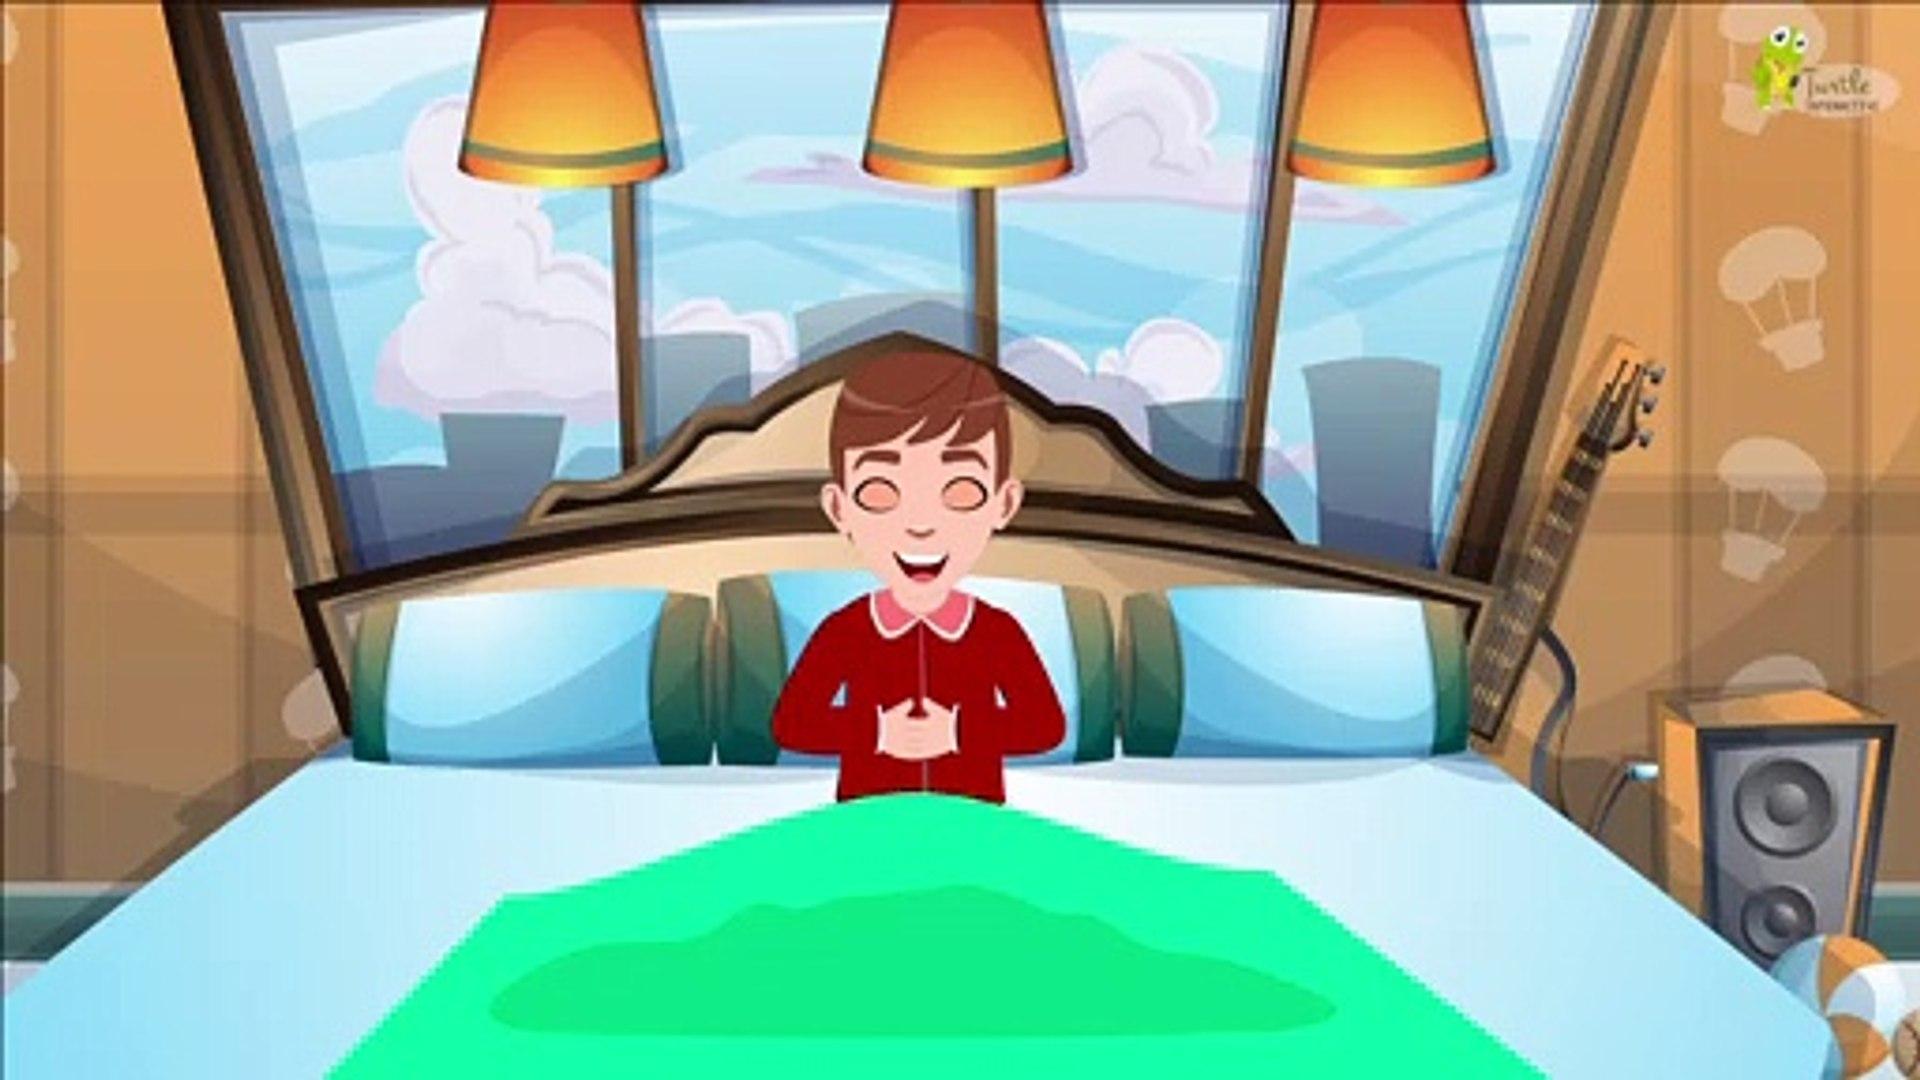 Brush Brush Brush your teeth - Kids Nursery Rhyme - Education Park